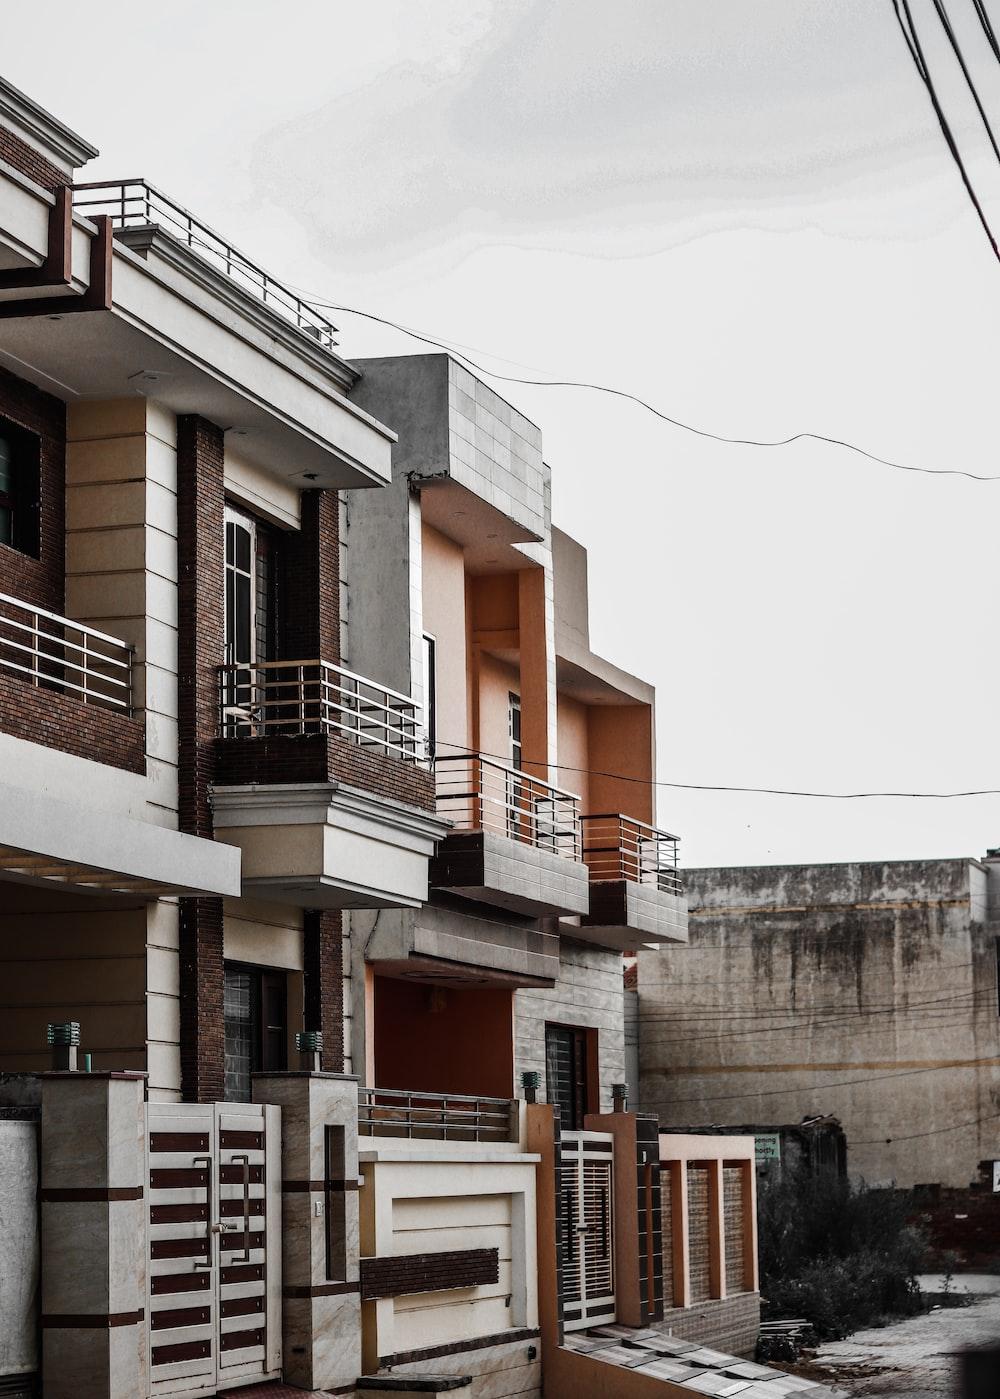 2-storey brown concrete building